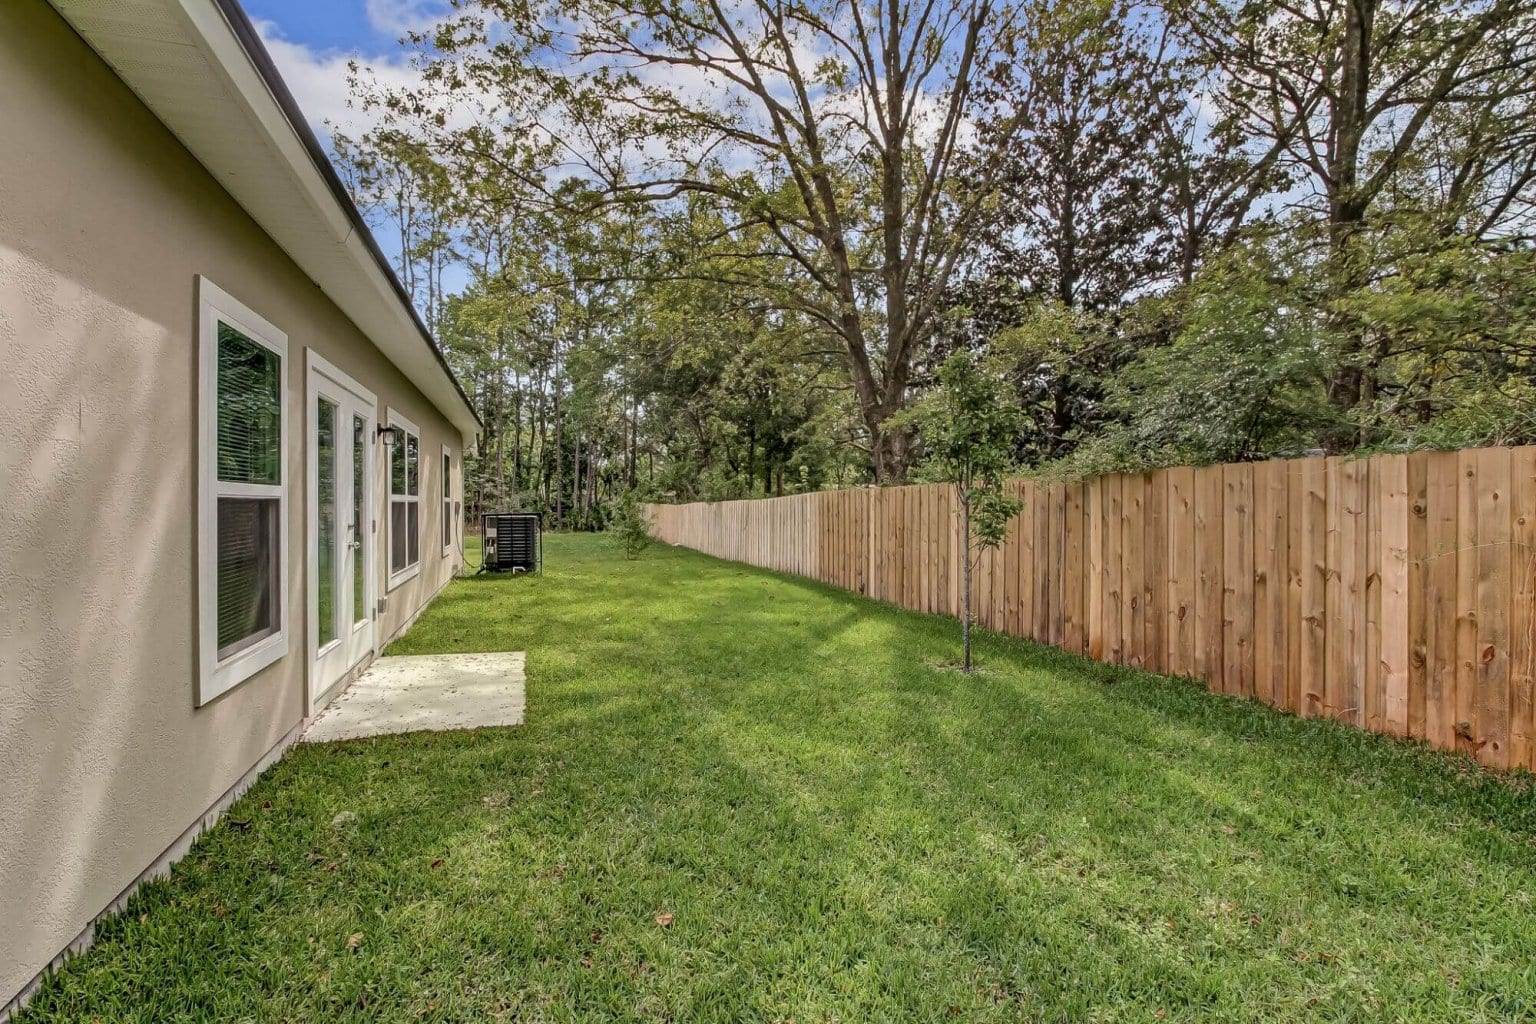 backyard and fence